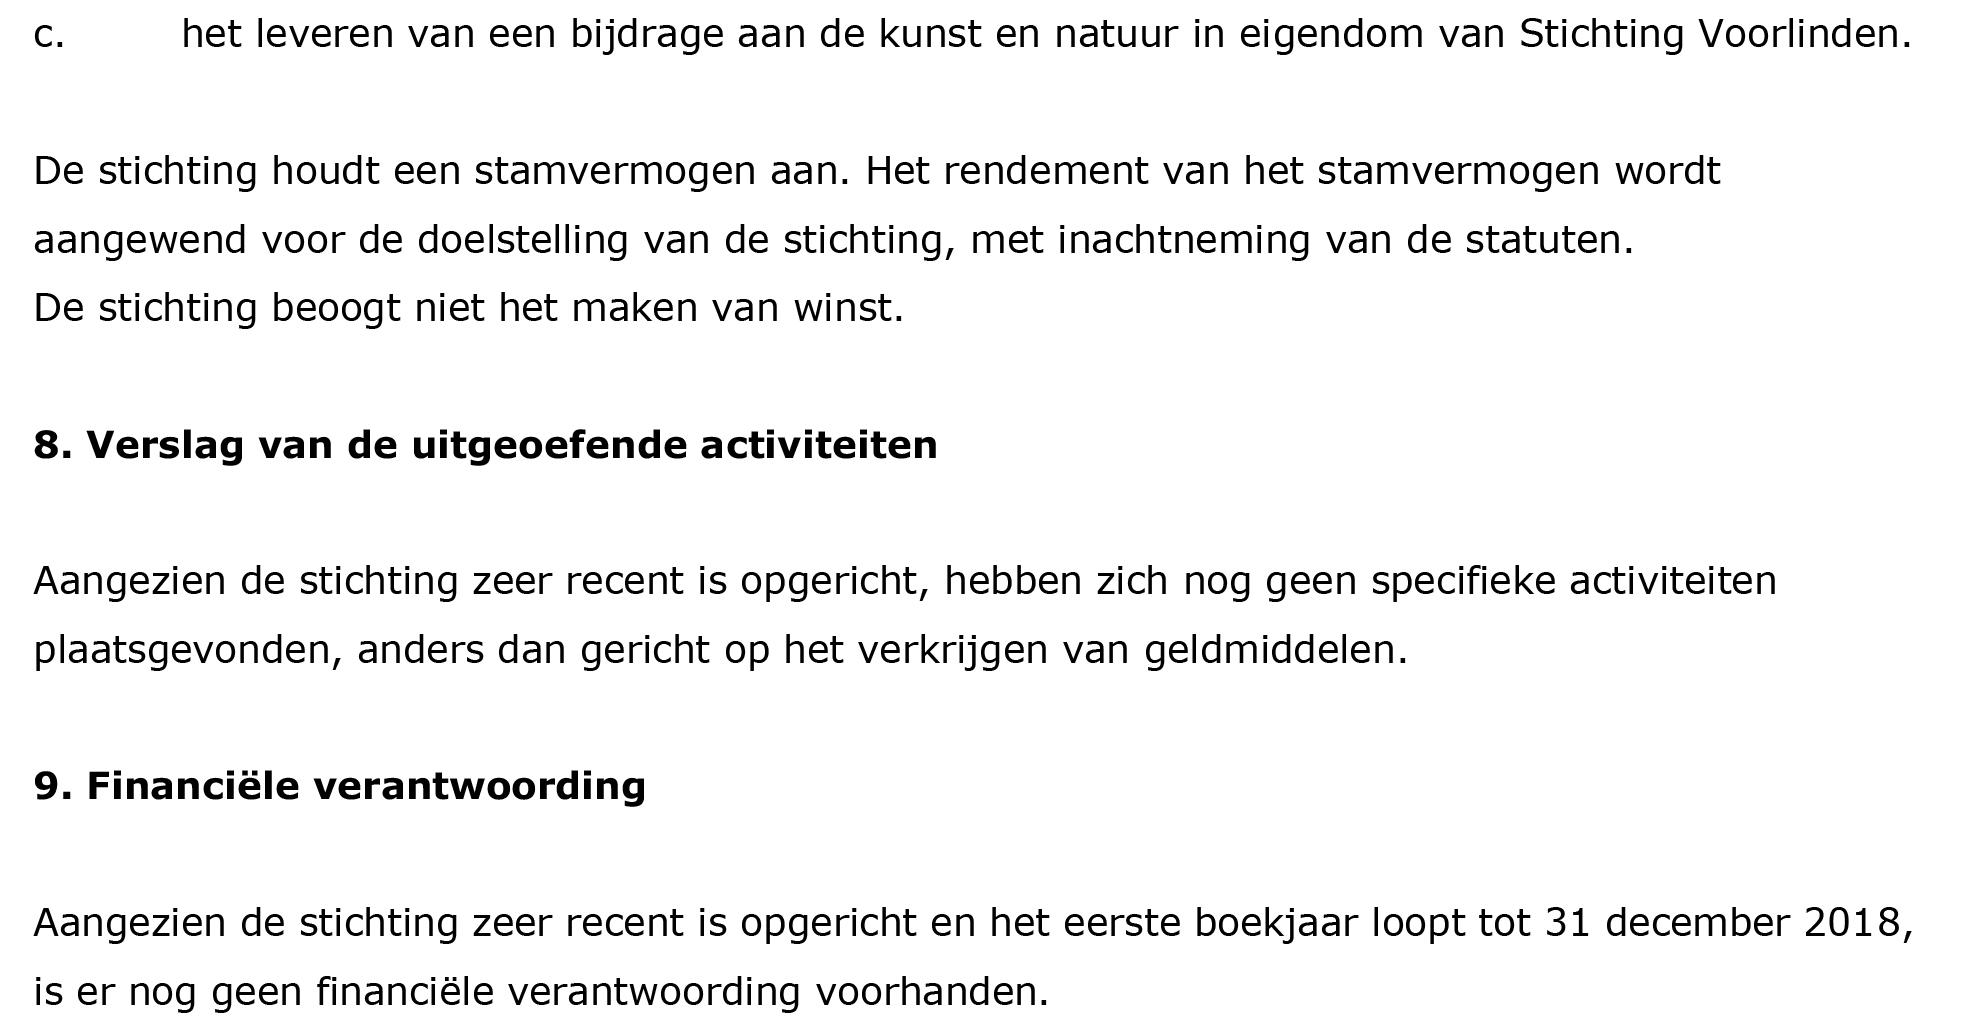 ANBI-gegevens Joop van Caldenborgh Stichting v2.docx-2